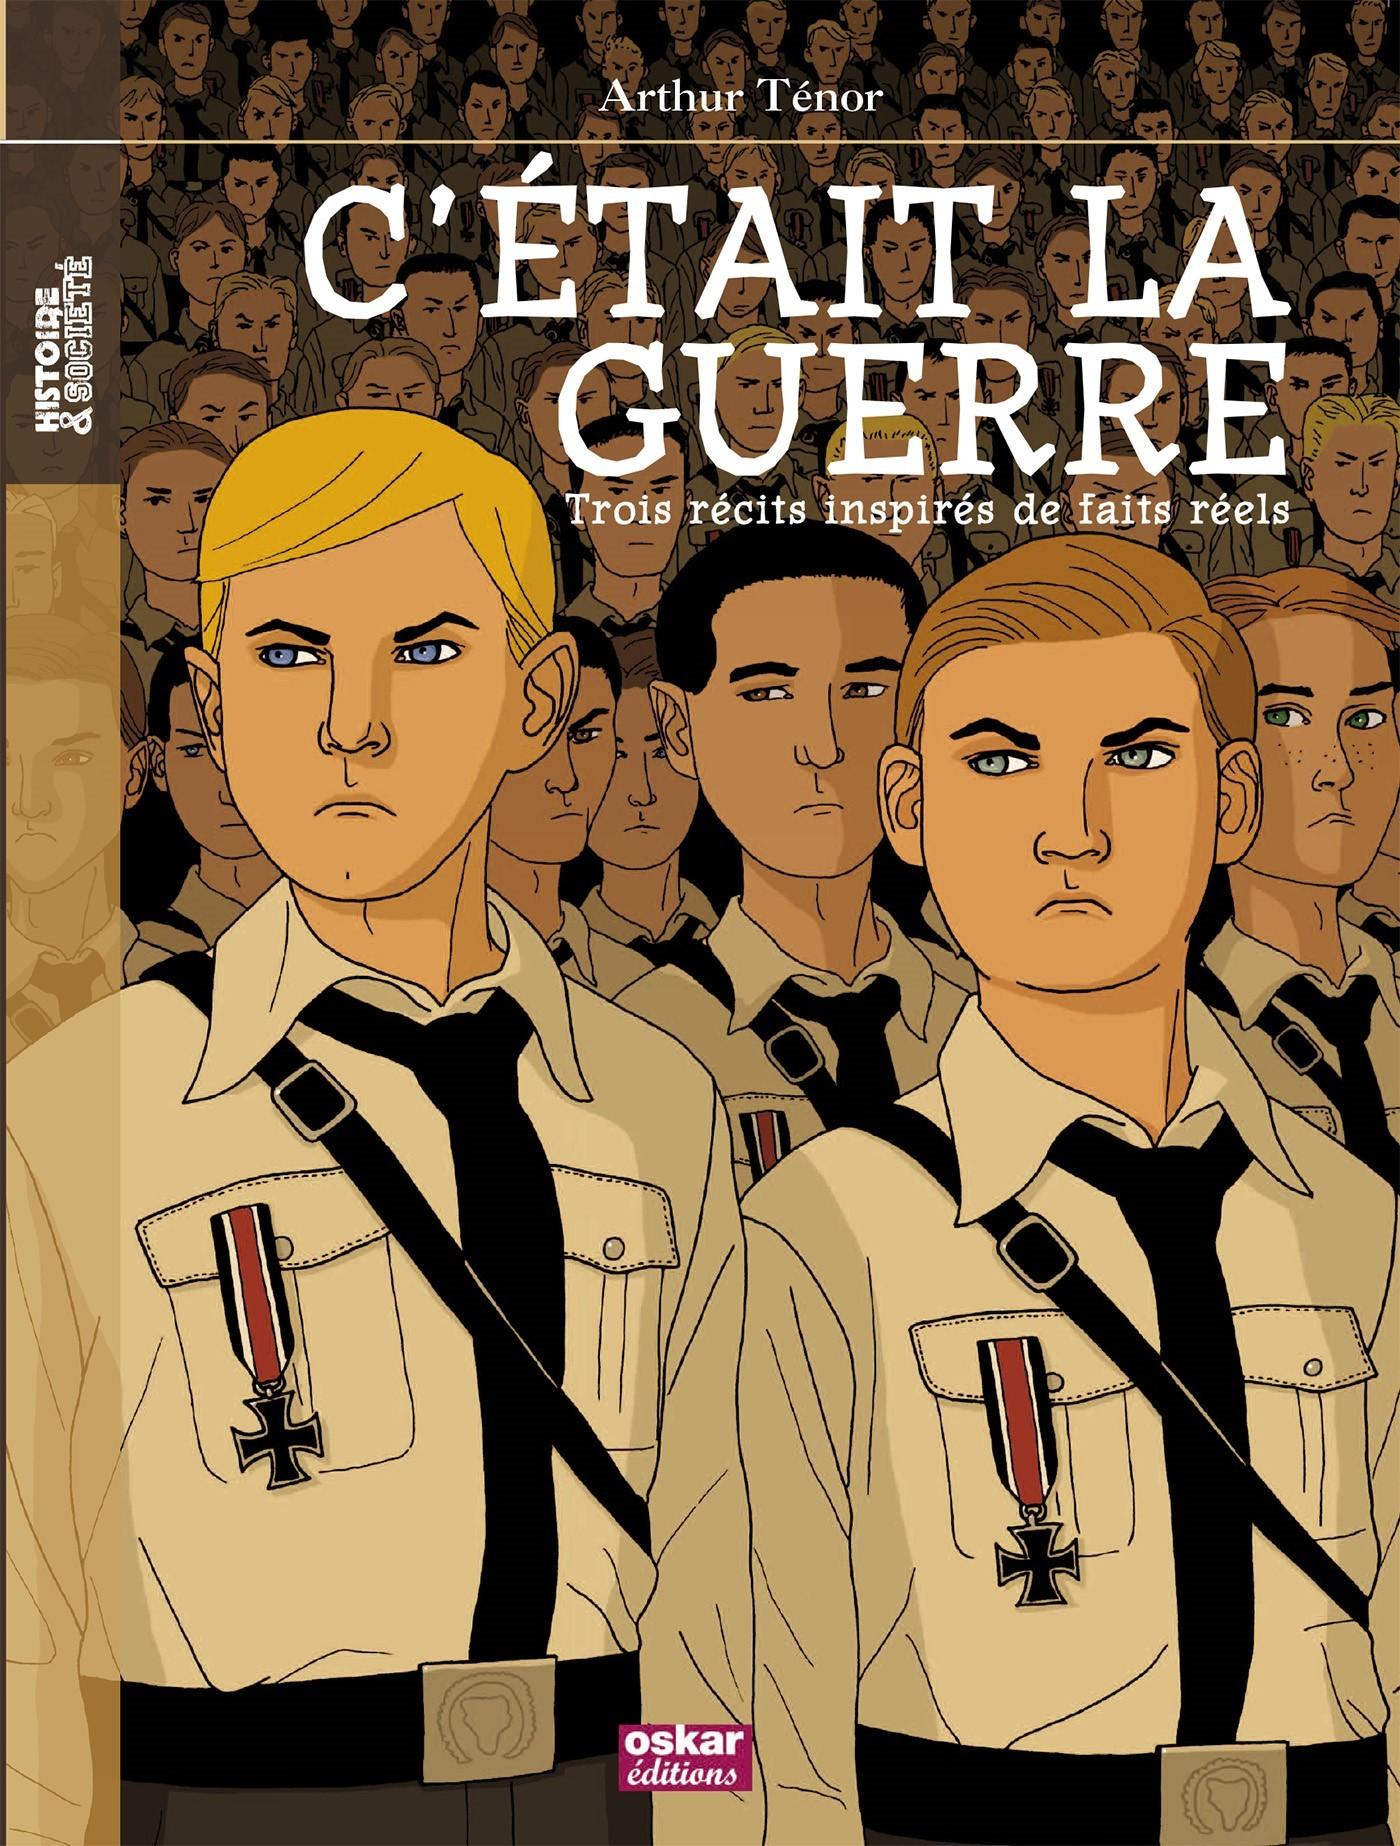 C'ETAIT LA GUERRE-3 RECITS INSPIRES FAIT - TROIS RECITS INSPIRES DE FAITS REELS